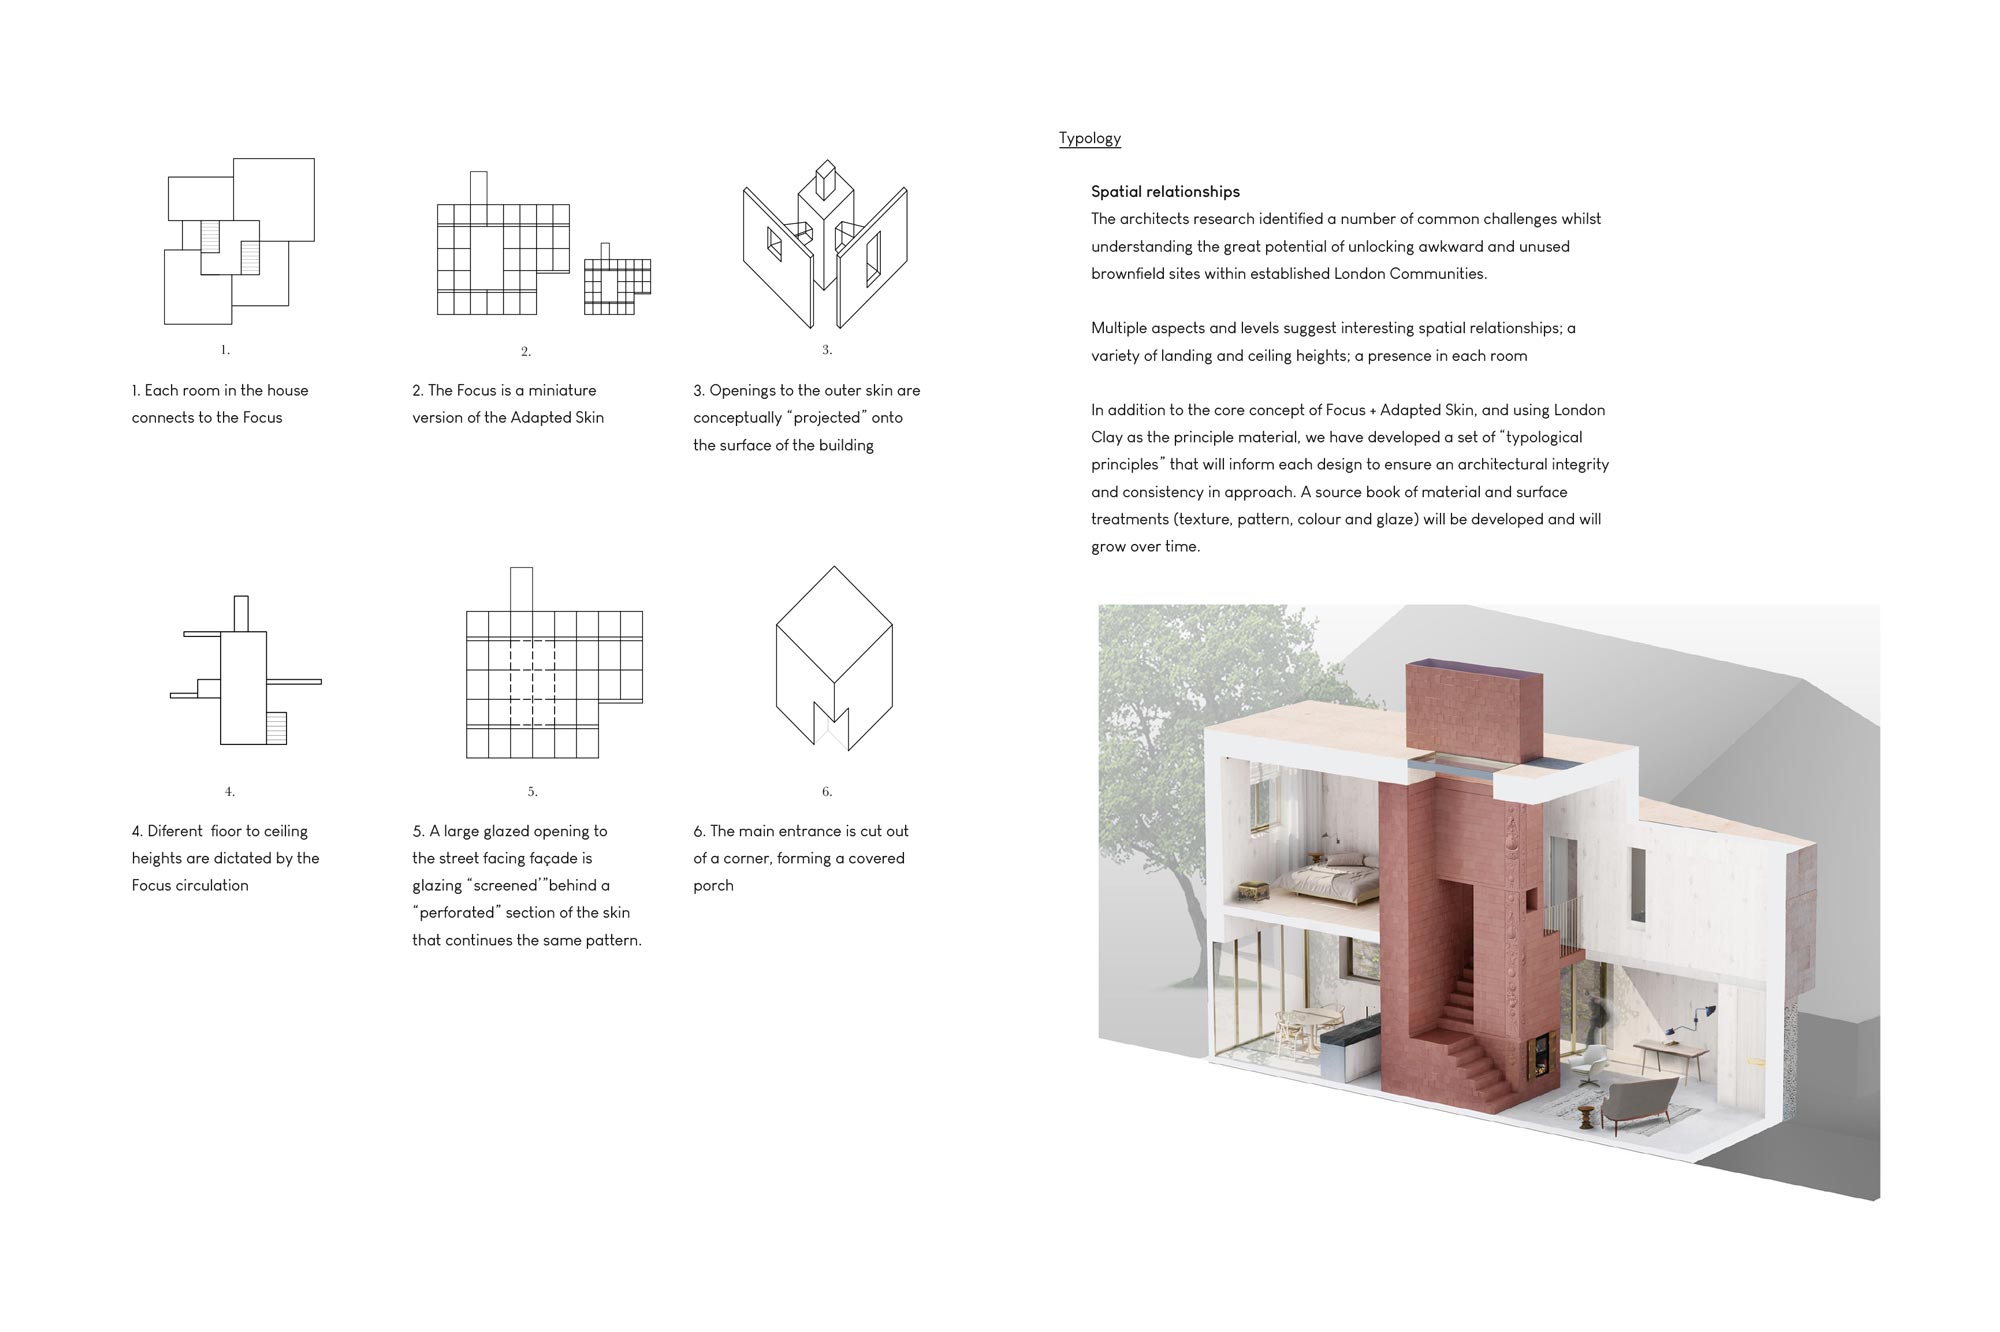 cube-haus-scdlp-n11-cs-2000×1332-05